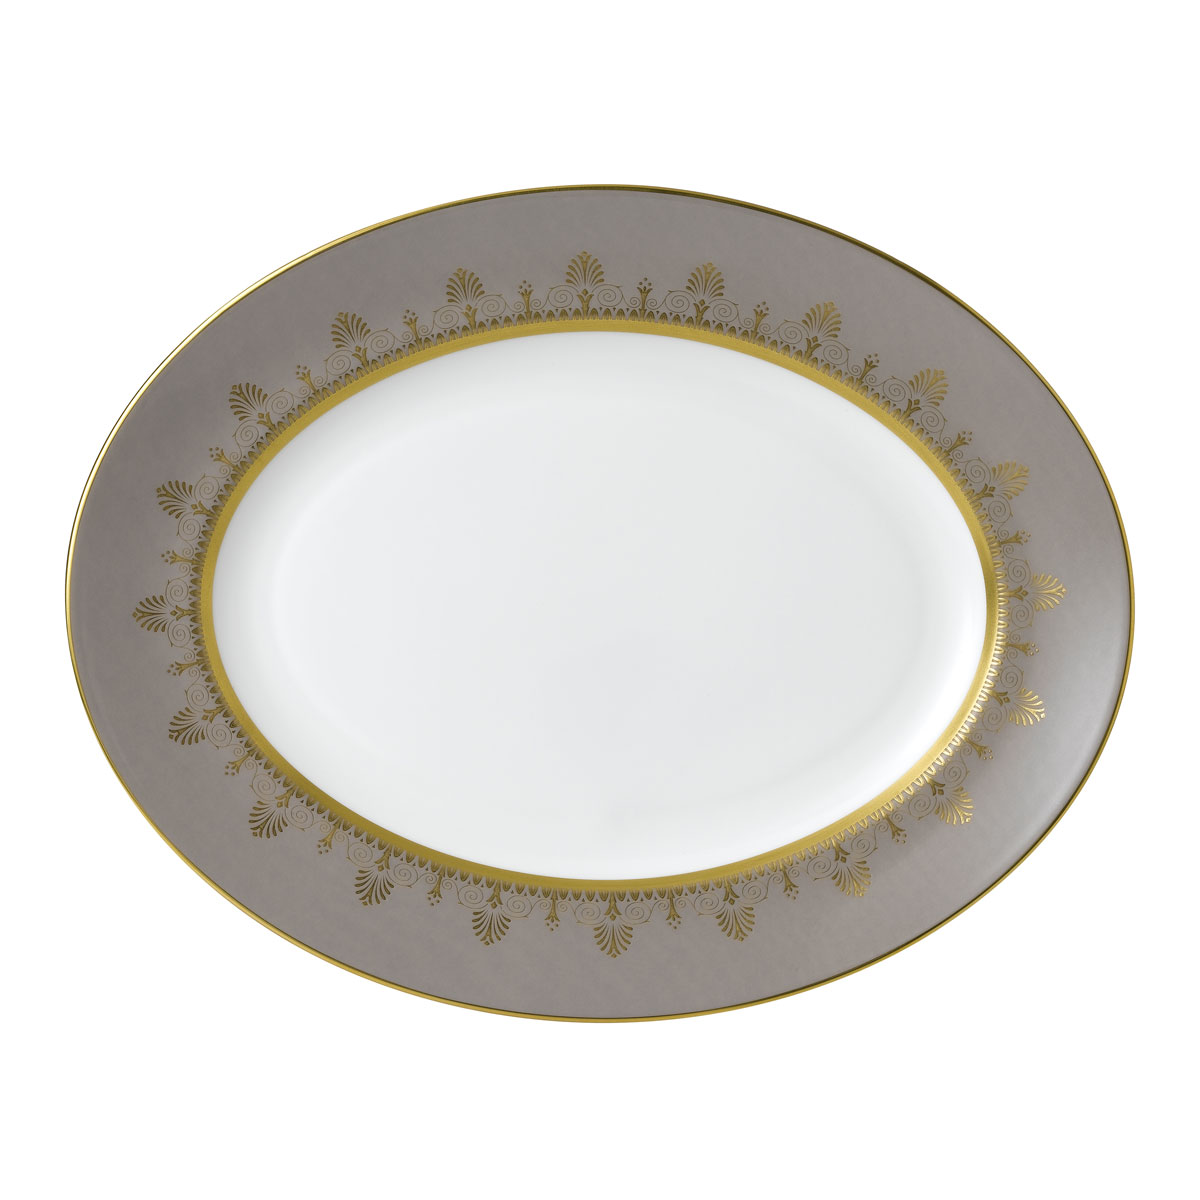 "Wedgwood Anthemion Grey Oval Platter 13.75"""